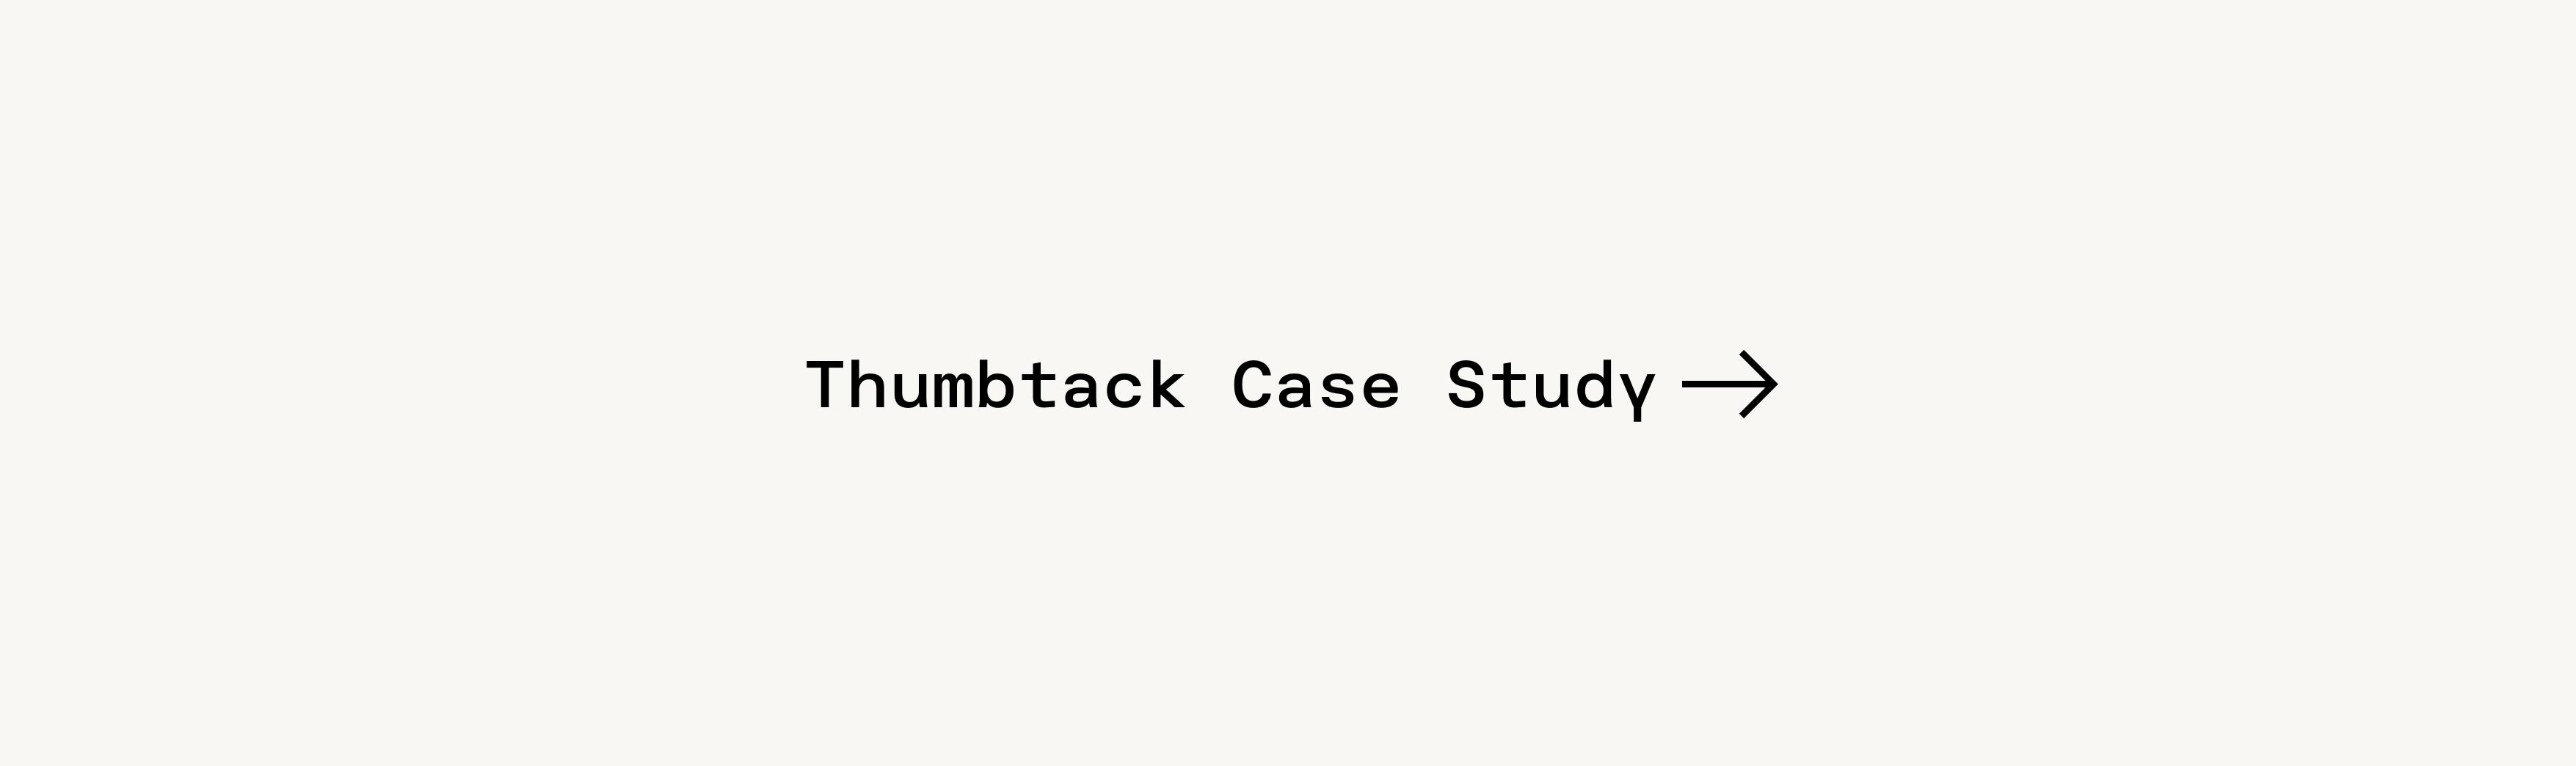 thumbtack article